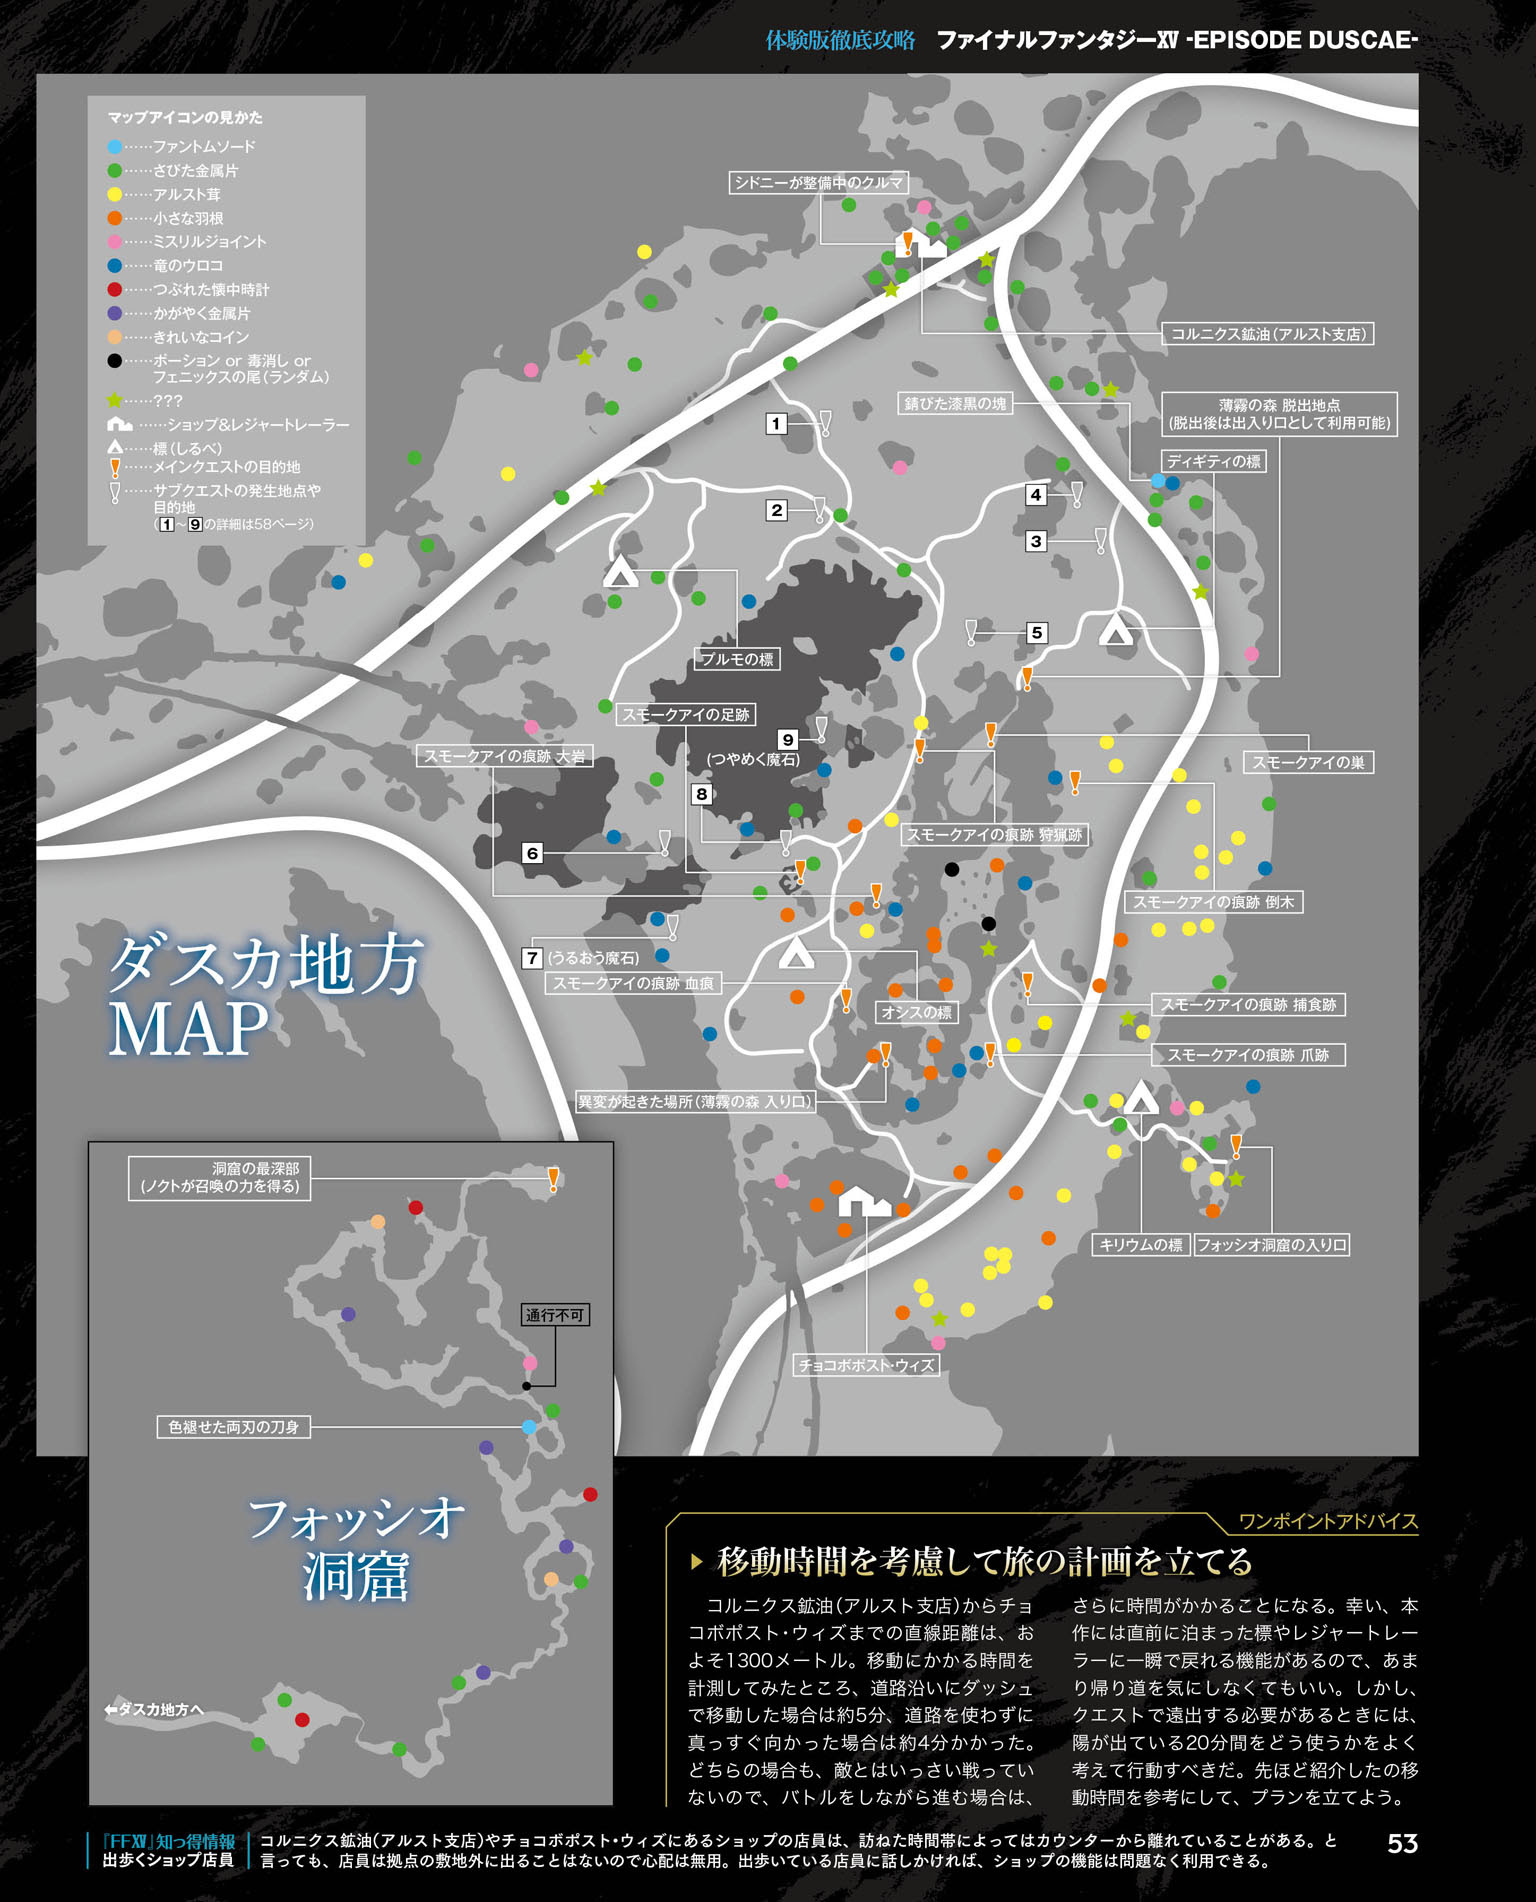 Destiny 2 Nessus Treasure Map Arcadian Valley : destiny, nessus, treasure, arcadian, valley, February